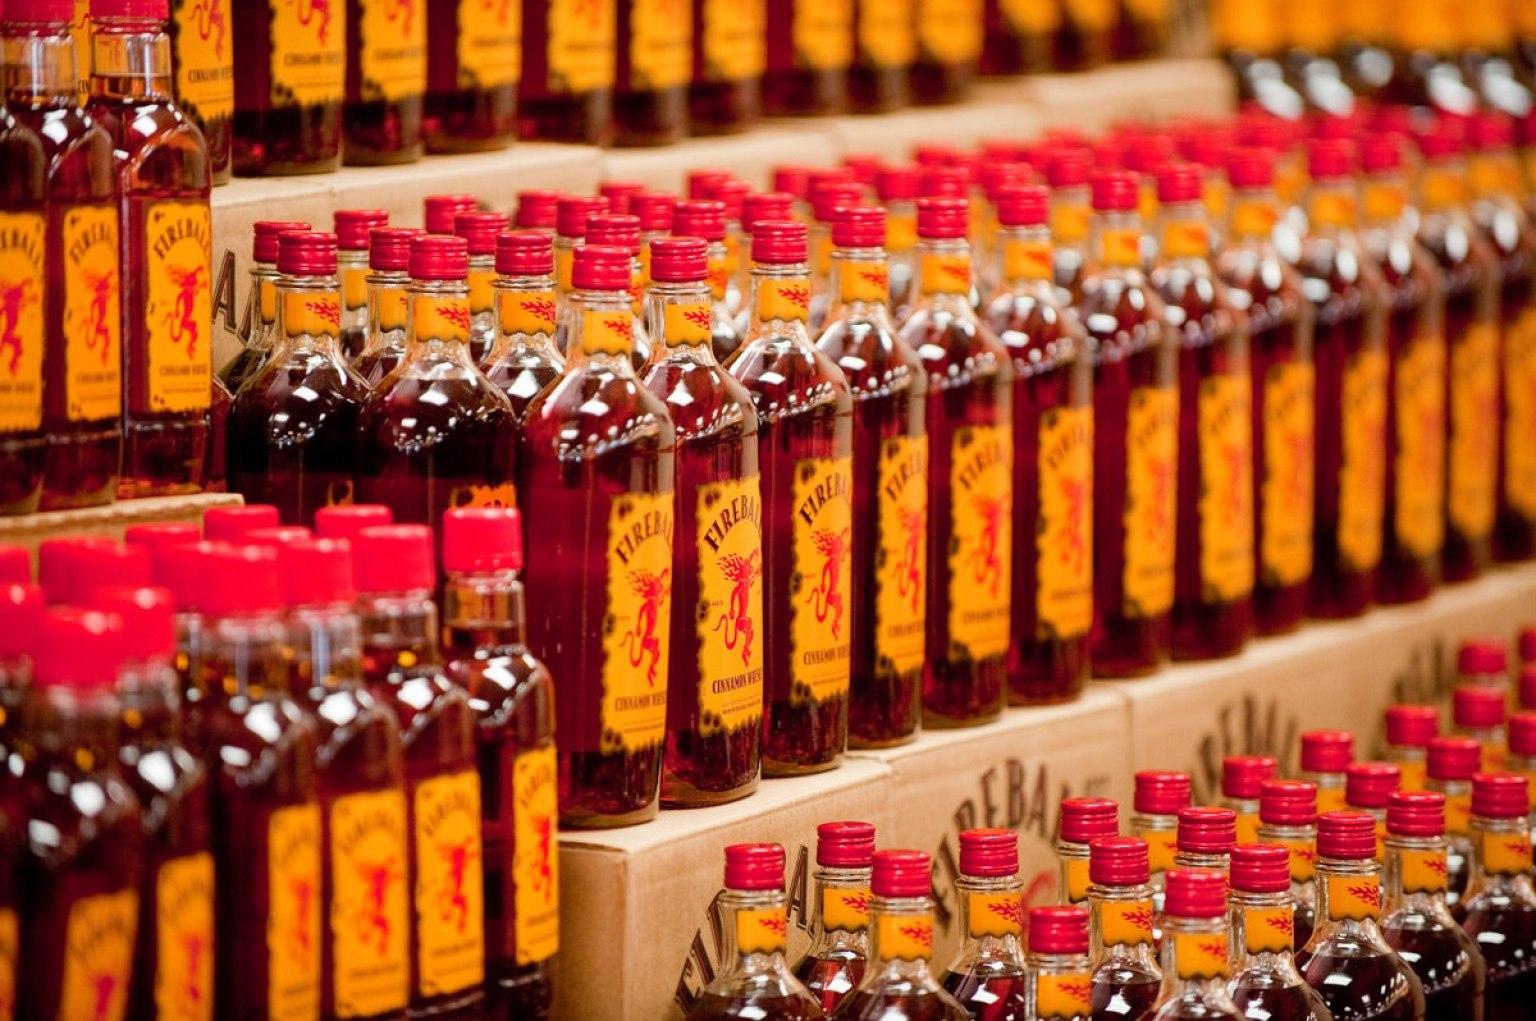 Fireball Cinnamon Whisky Is The Most Popular Liquor Brand